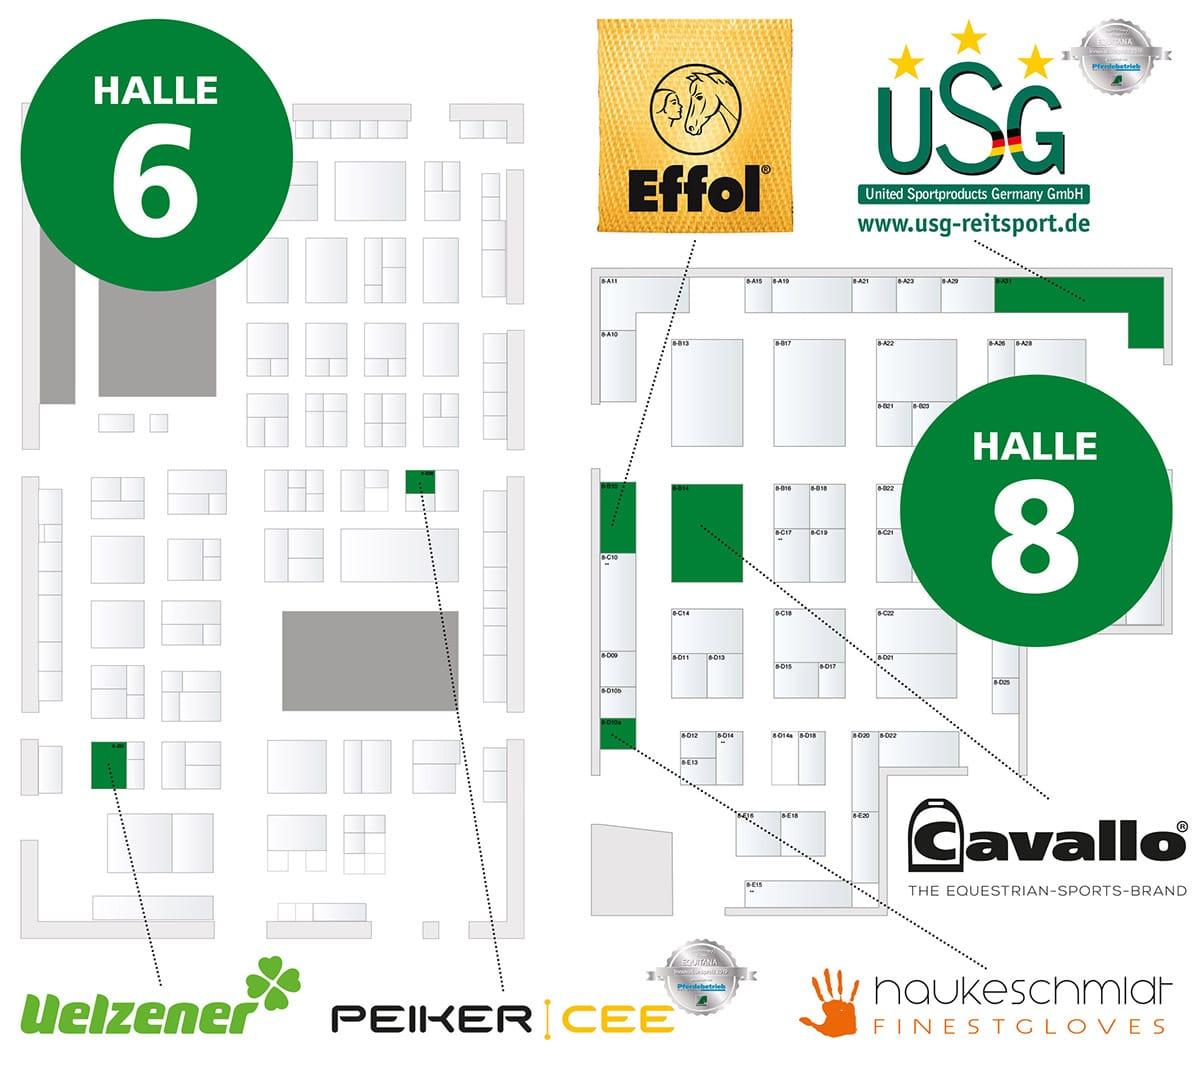 Equitana 2019 Halle 6+8